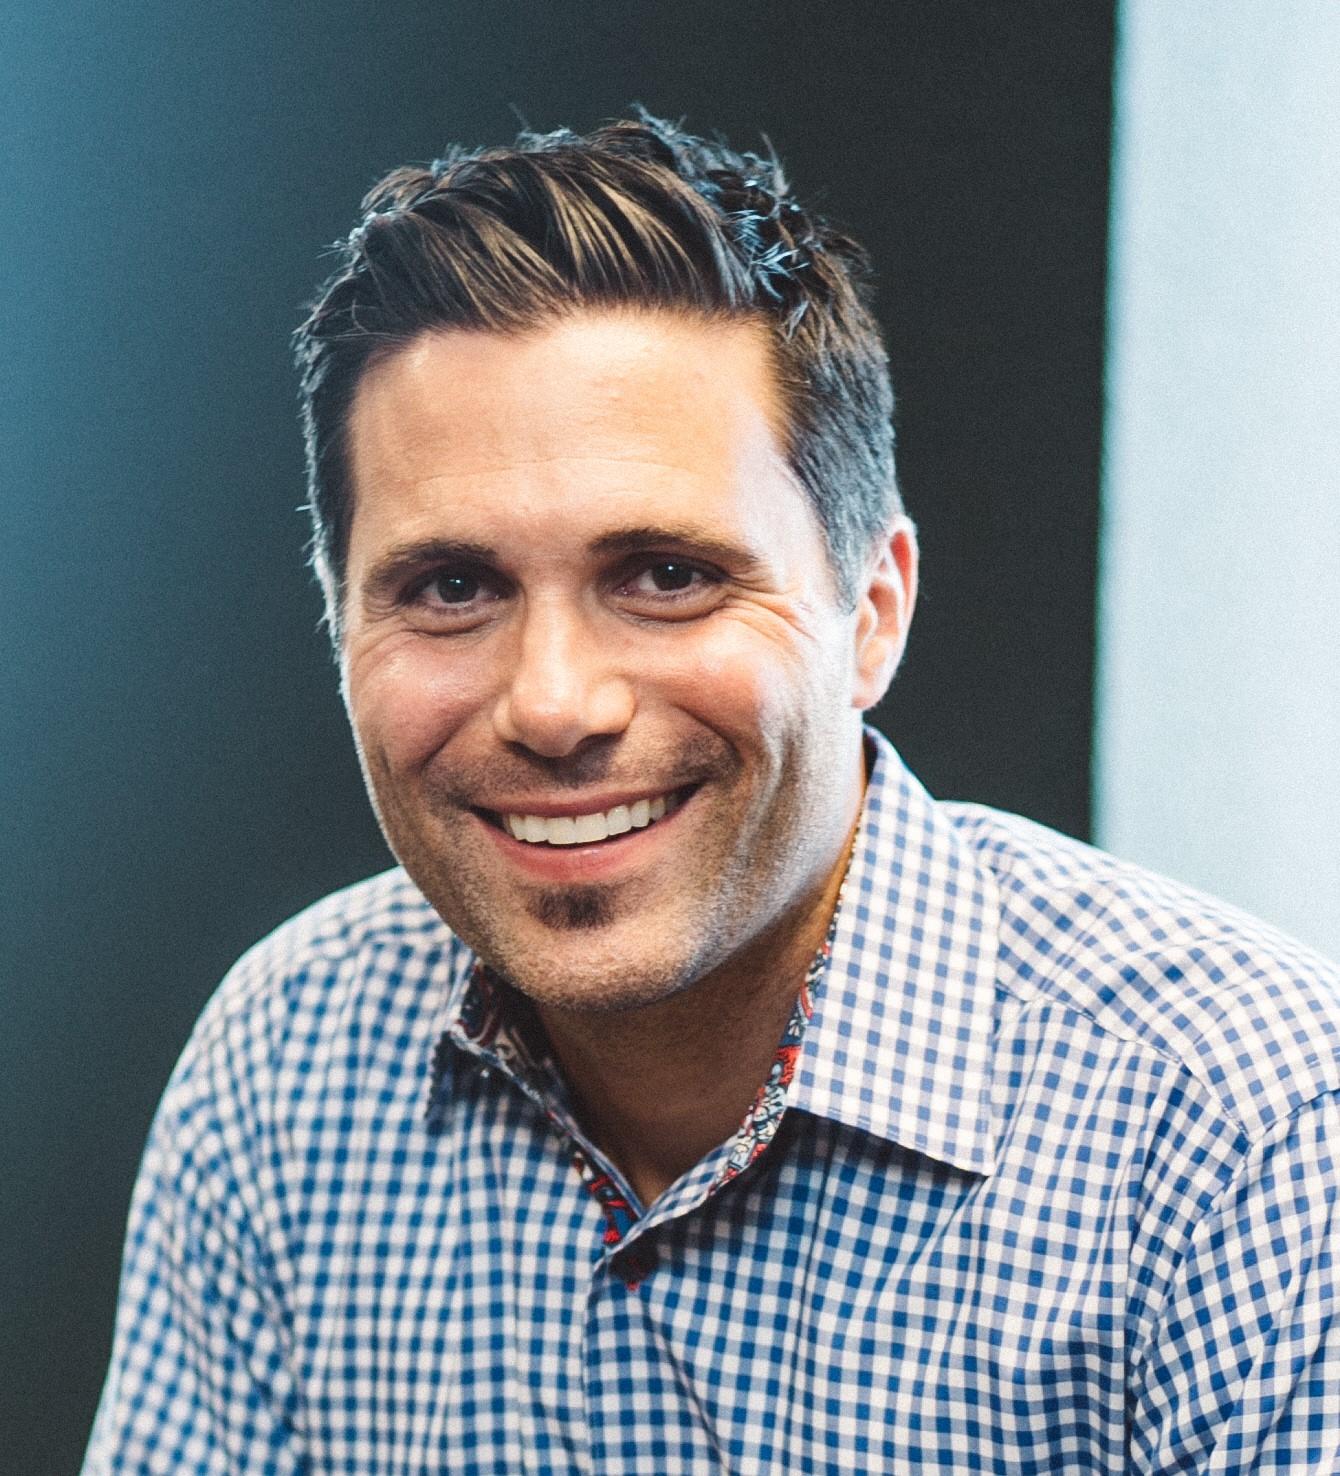 Photo of Tim Kachuriak